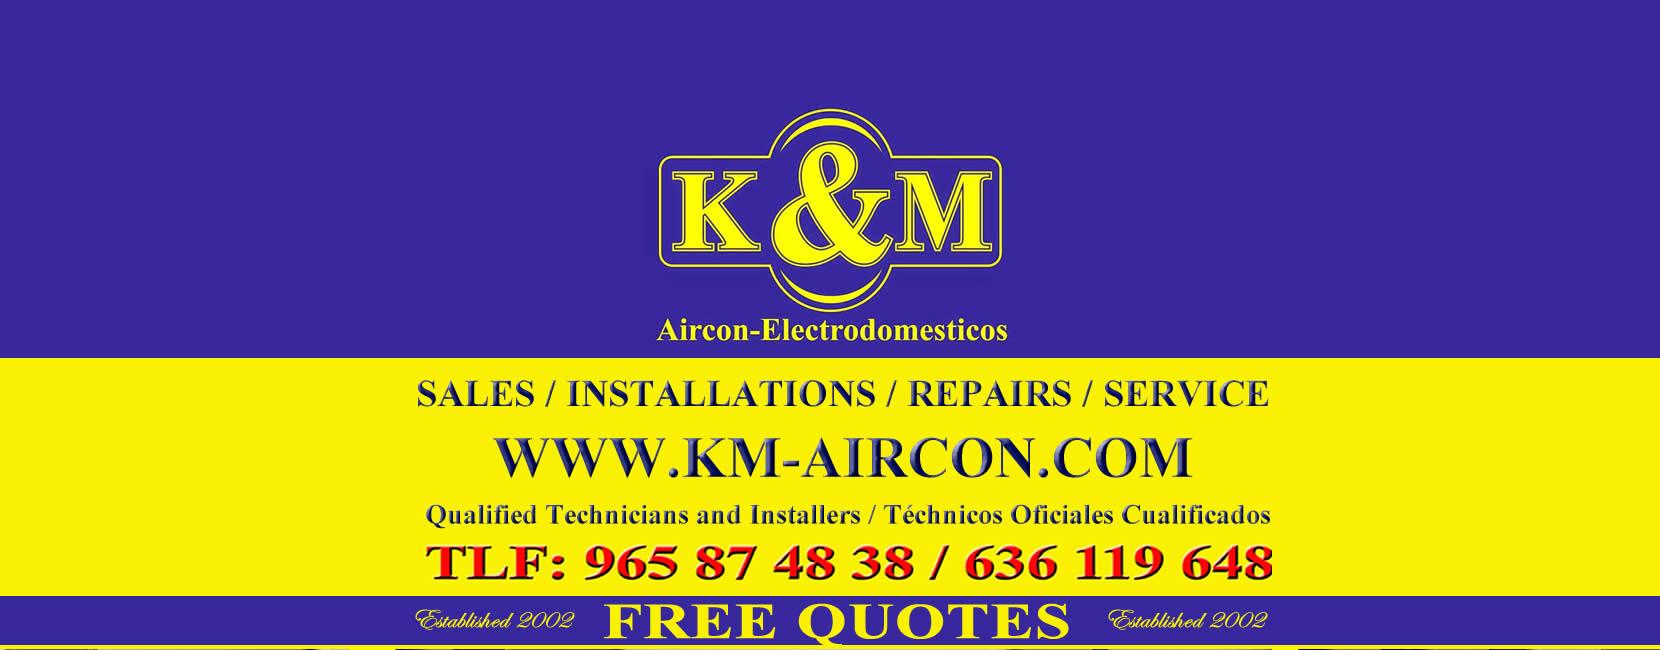 K&M Airconditioning Costa Blanca